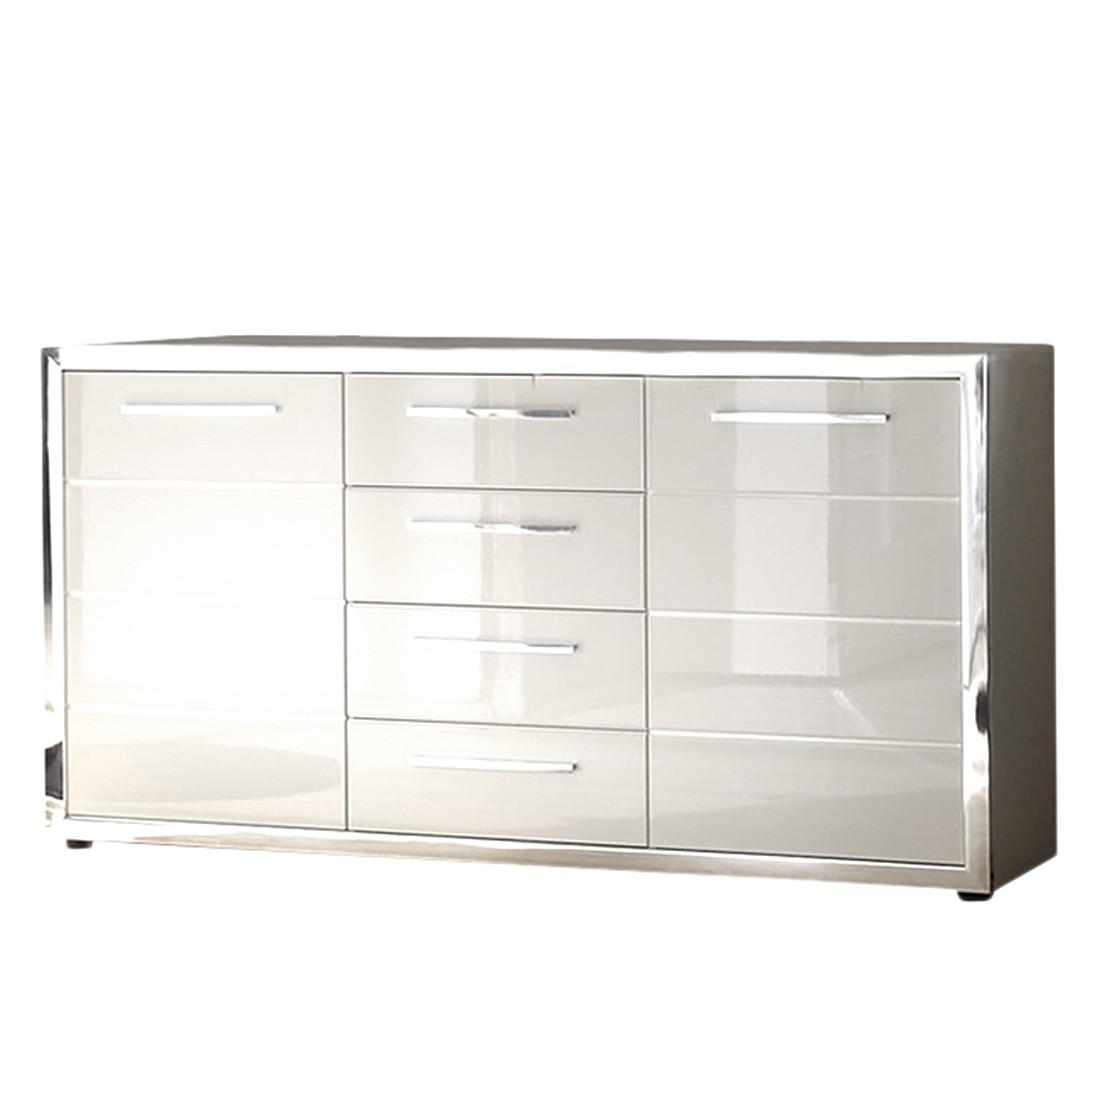 sideboard chrome hochglanz wei roomscape online bestellen. Black Bedroom Furniture Sets. Home Design Ideas